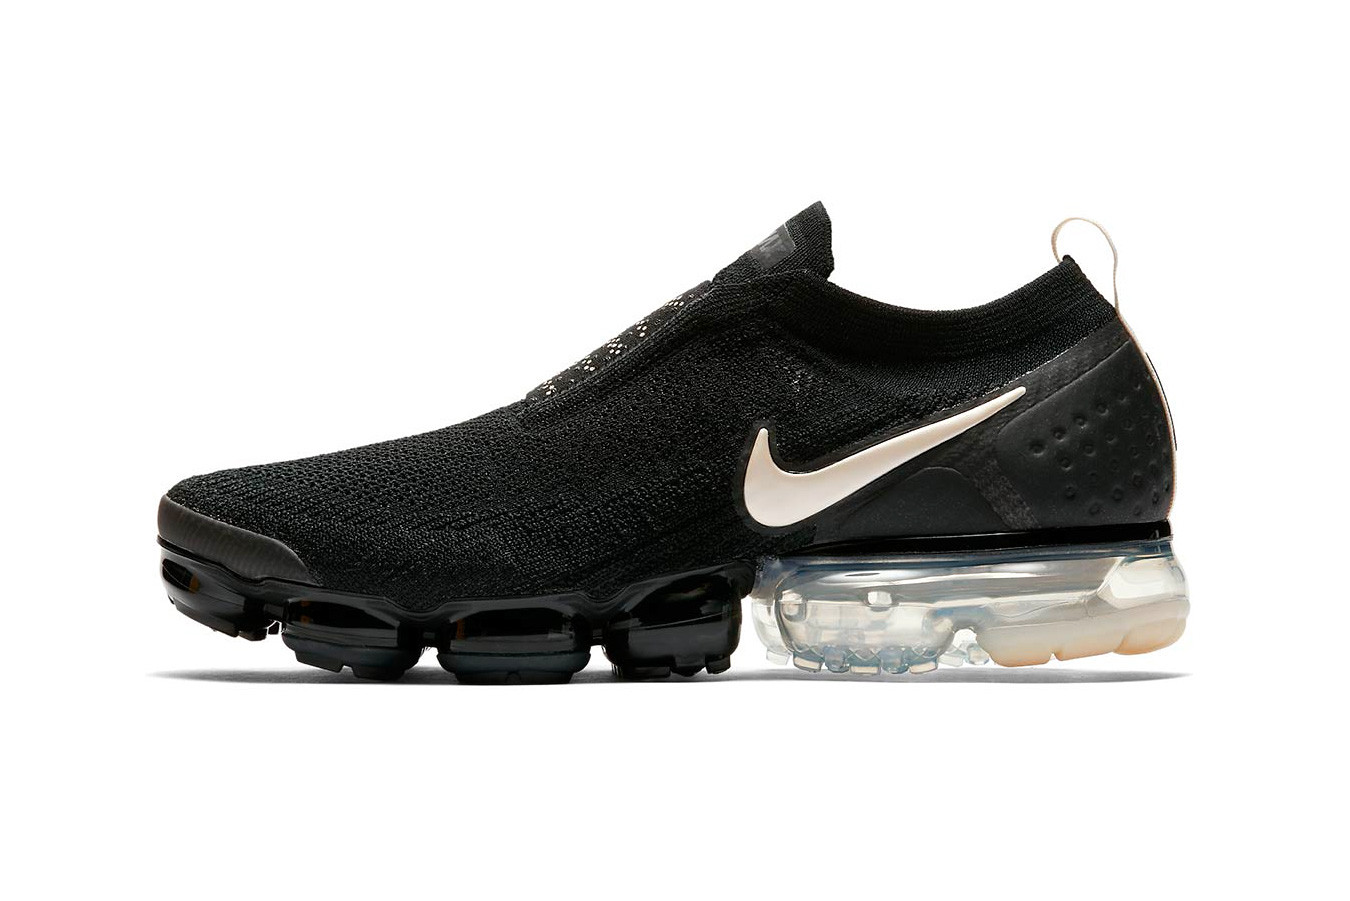 Nike Air VaporMax Moc 2 Black/Light